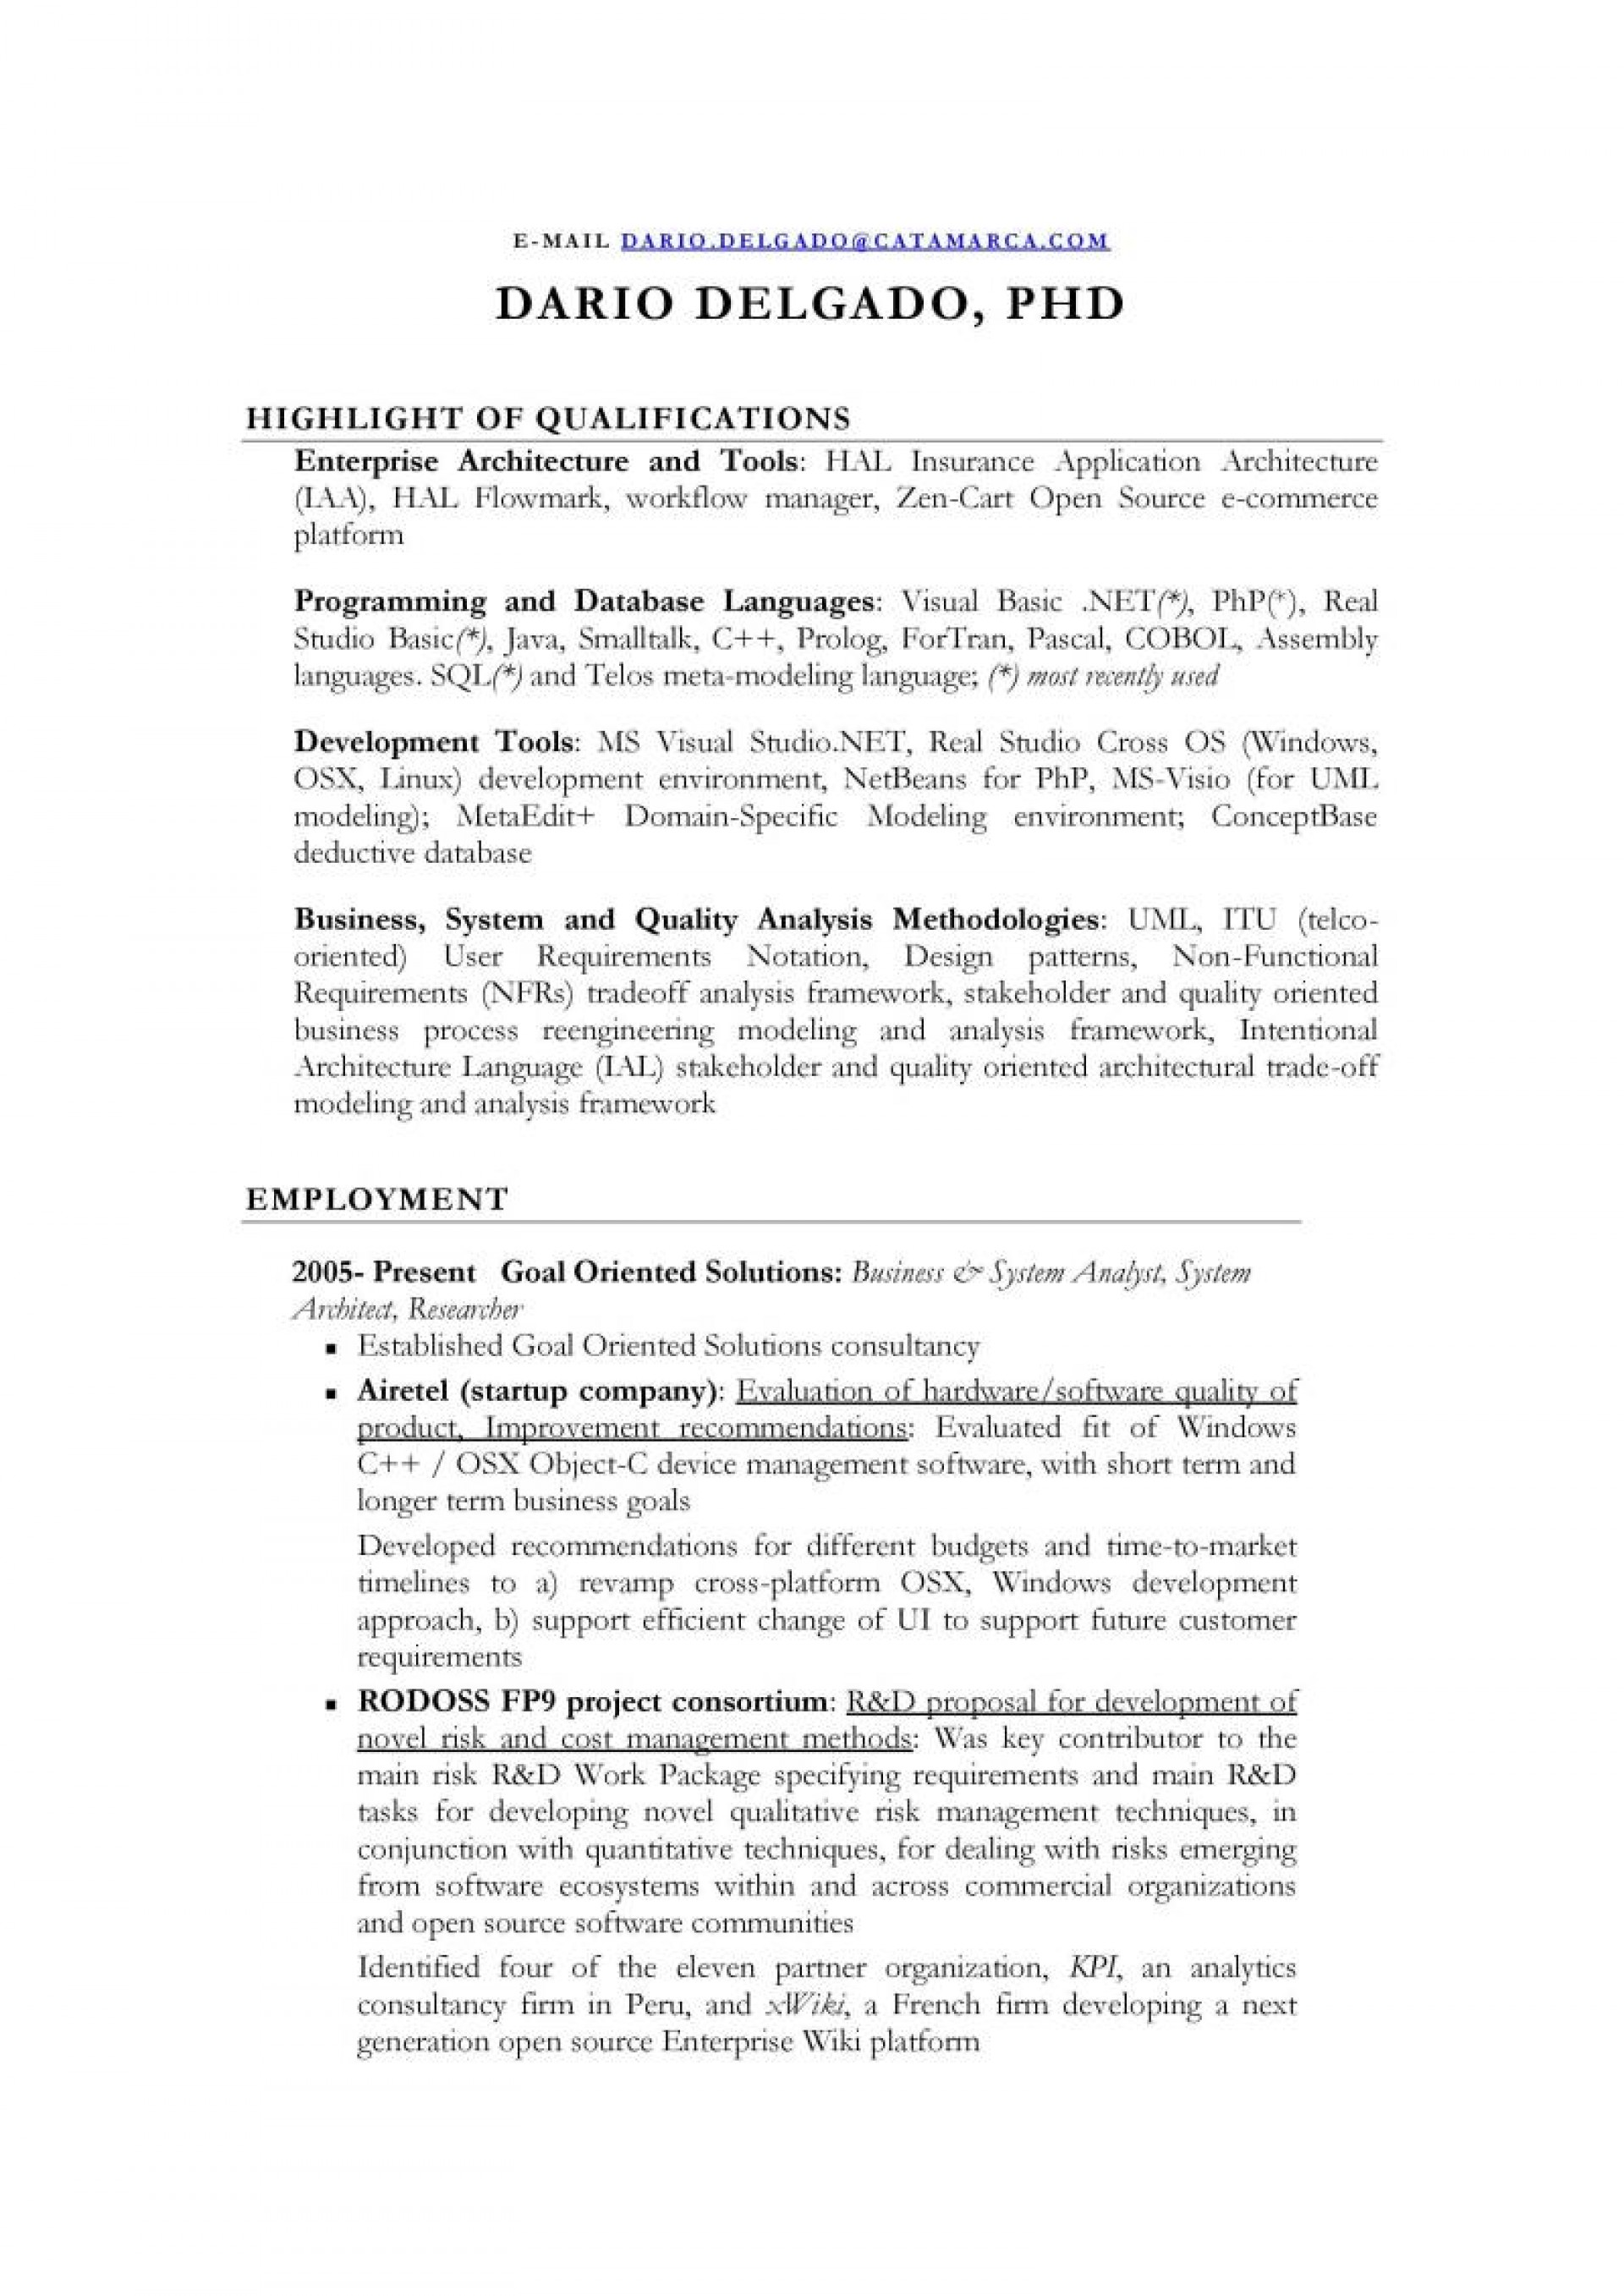 007 Sample Resume Net Developer Unique Essays Apply Texas Professional School Essay Example Of Developerresize8002c1131ssl1 Unusual Examples Topic A College 2016 C 1920